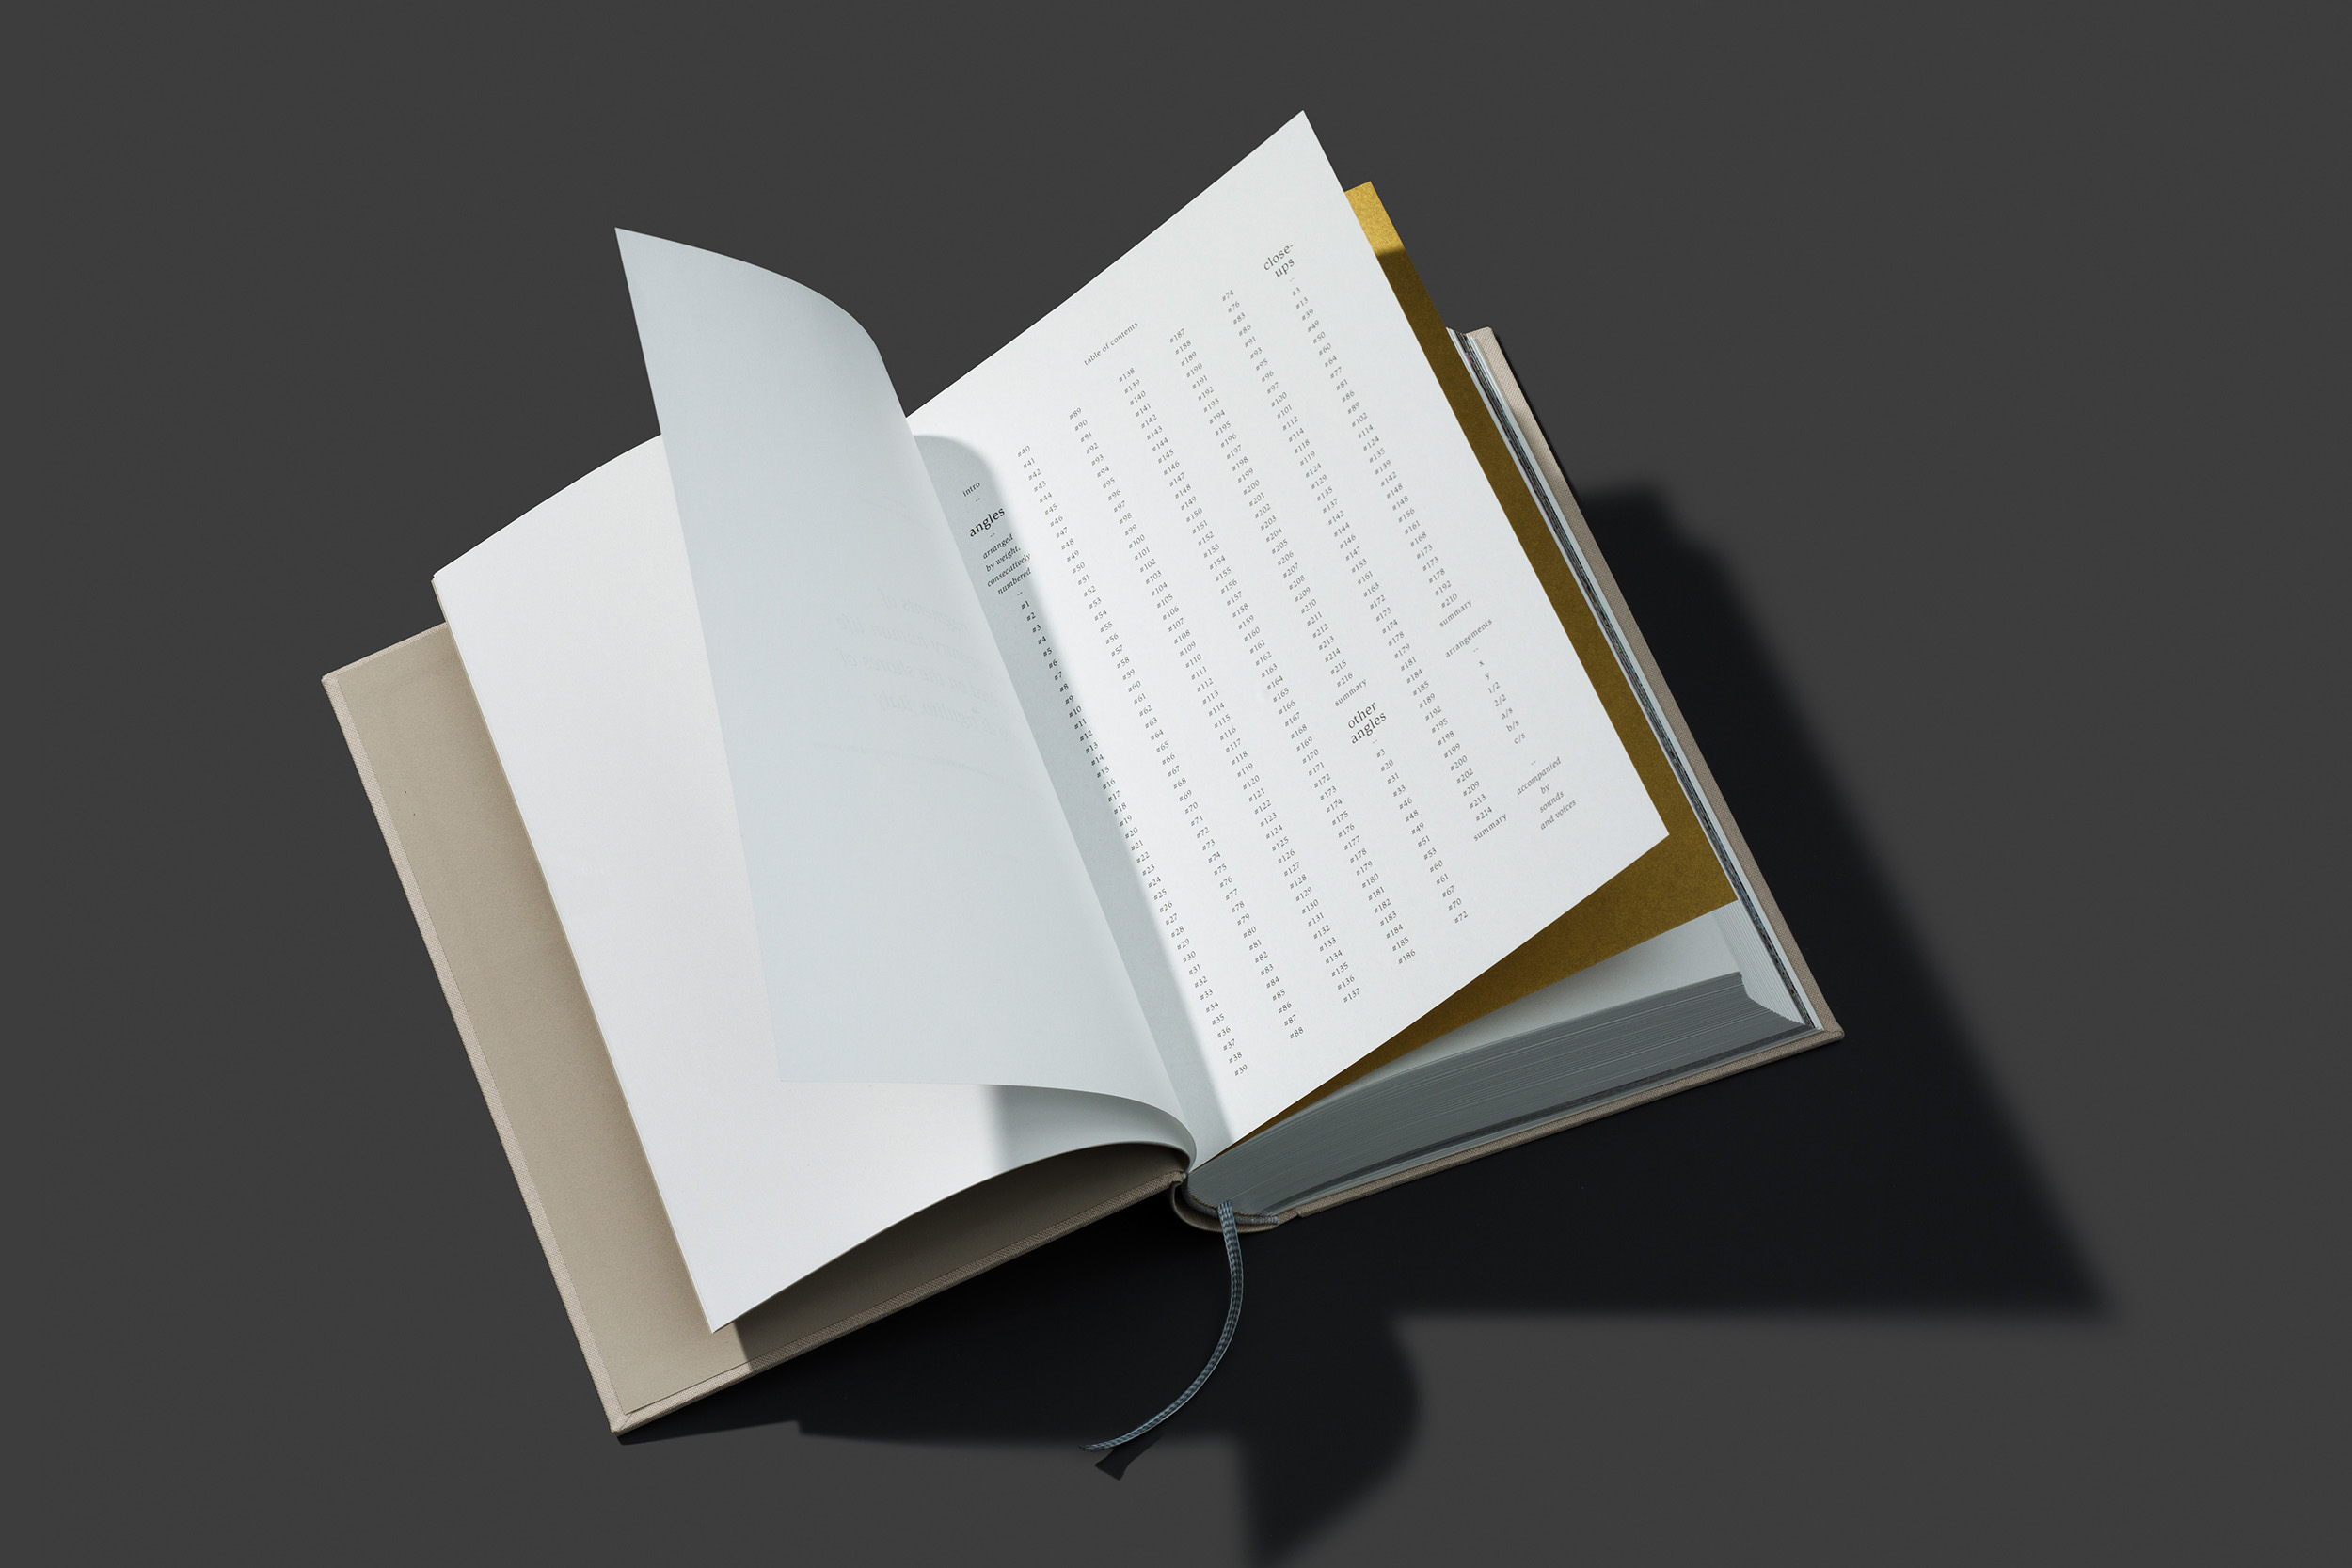 worthless_book_03.jpg